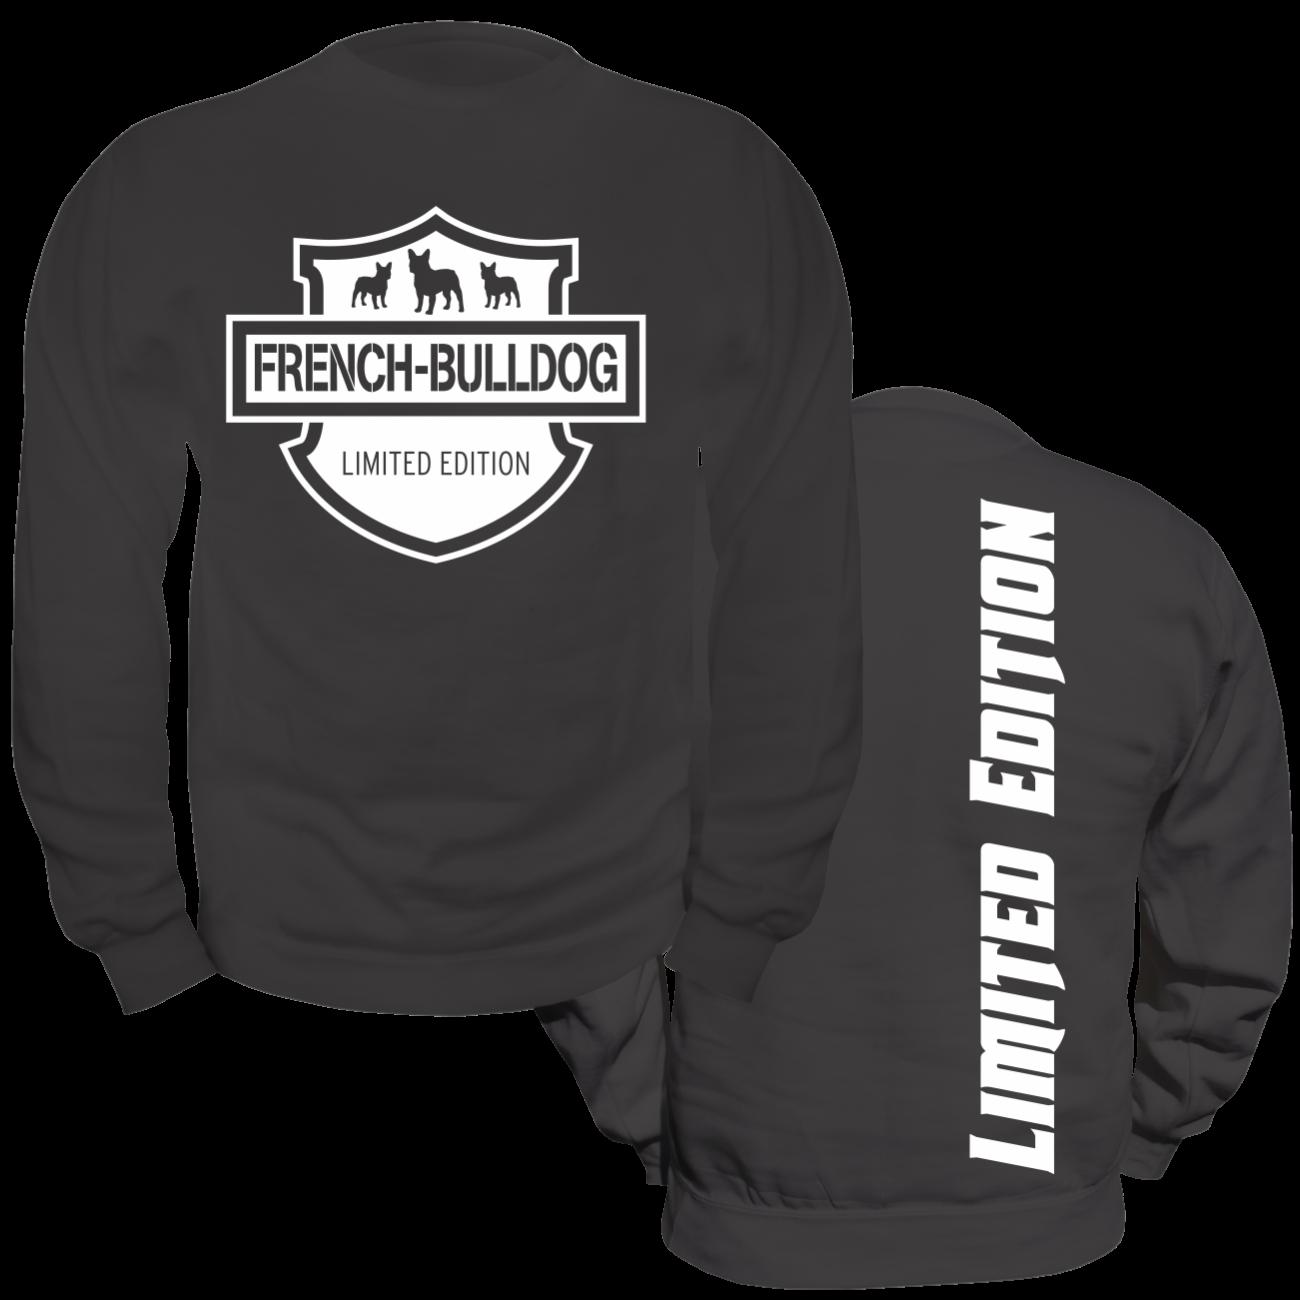 pullover sweatshirt french bulldog limited edition. Black Bedroom Furniture Sets. Home Design Ideas